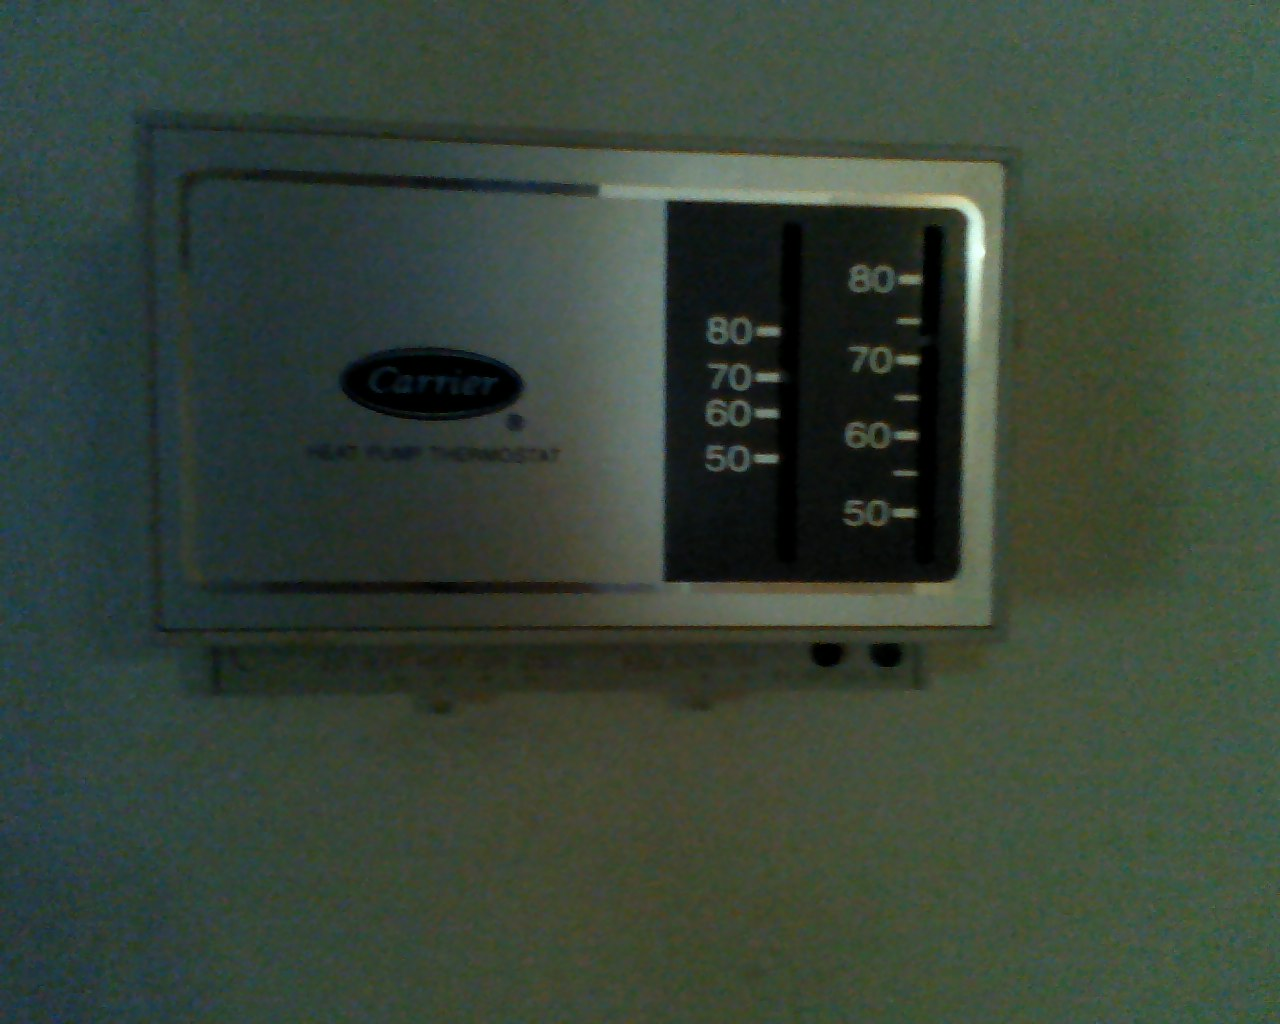 bryant plus 80 furnace thermostat wiring diagram bryant